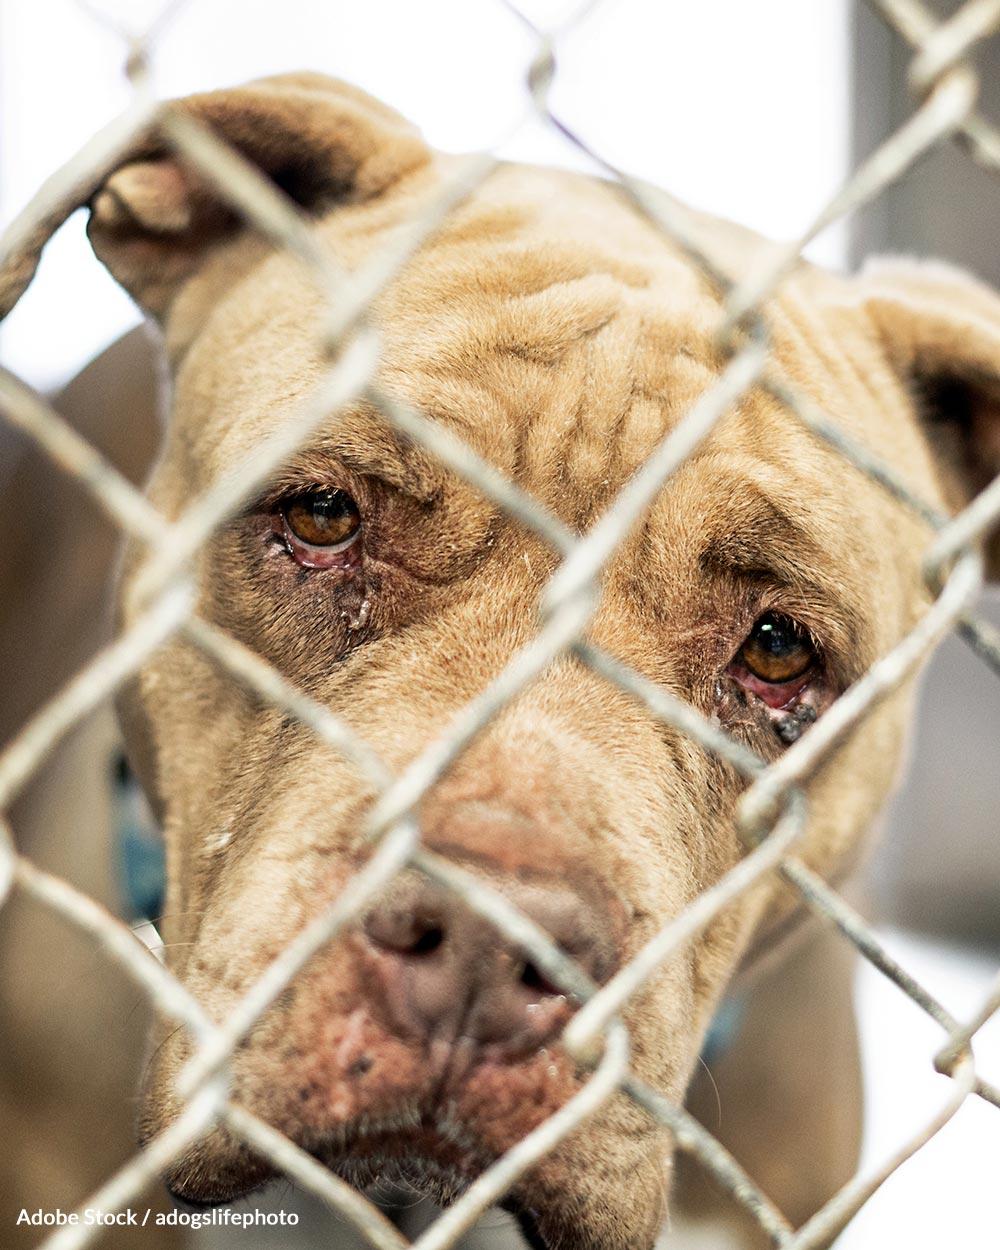 Take The Senior Pet Pledge And Change An Animal's Life